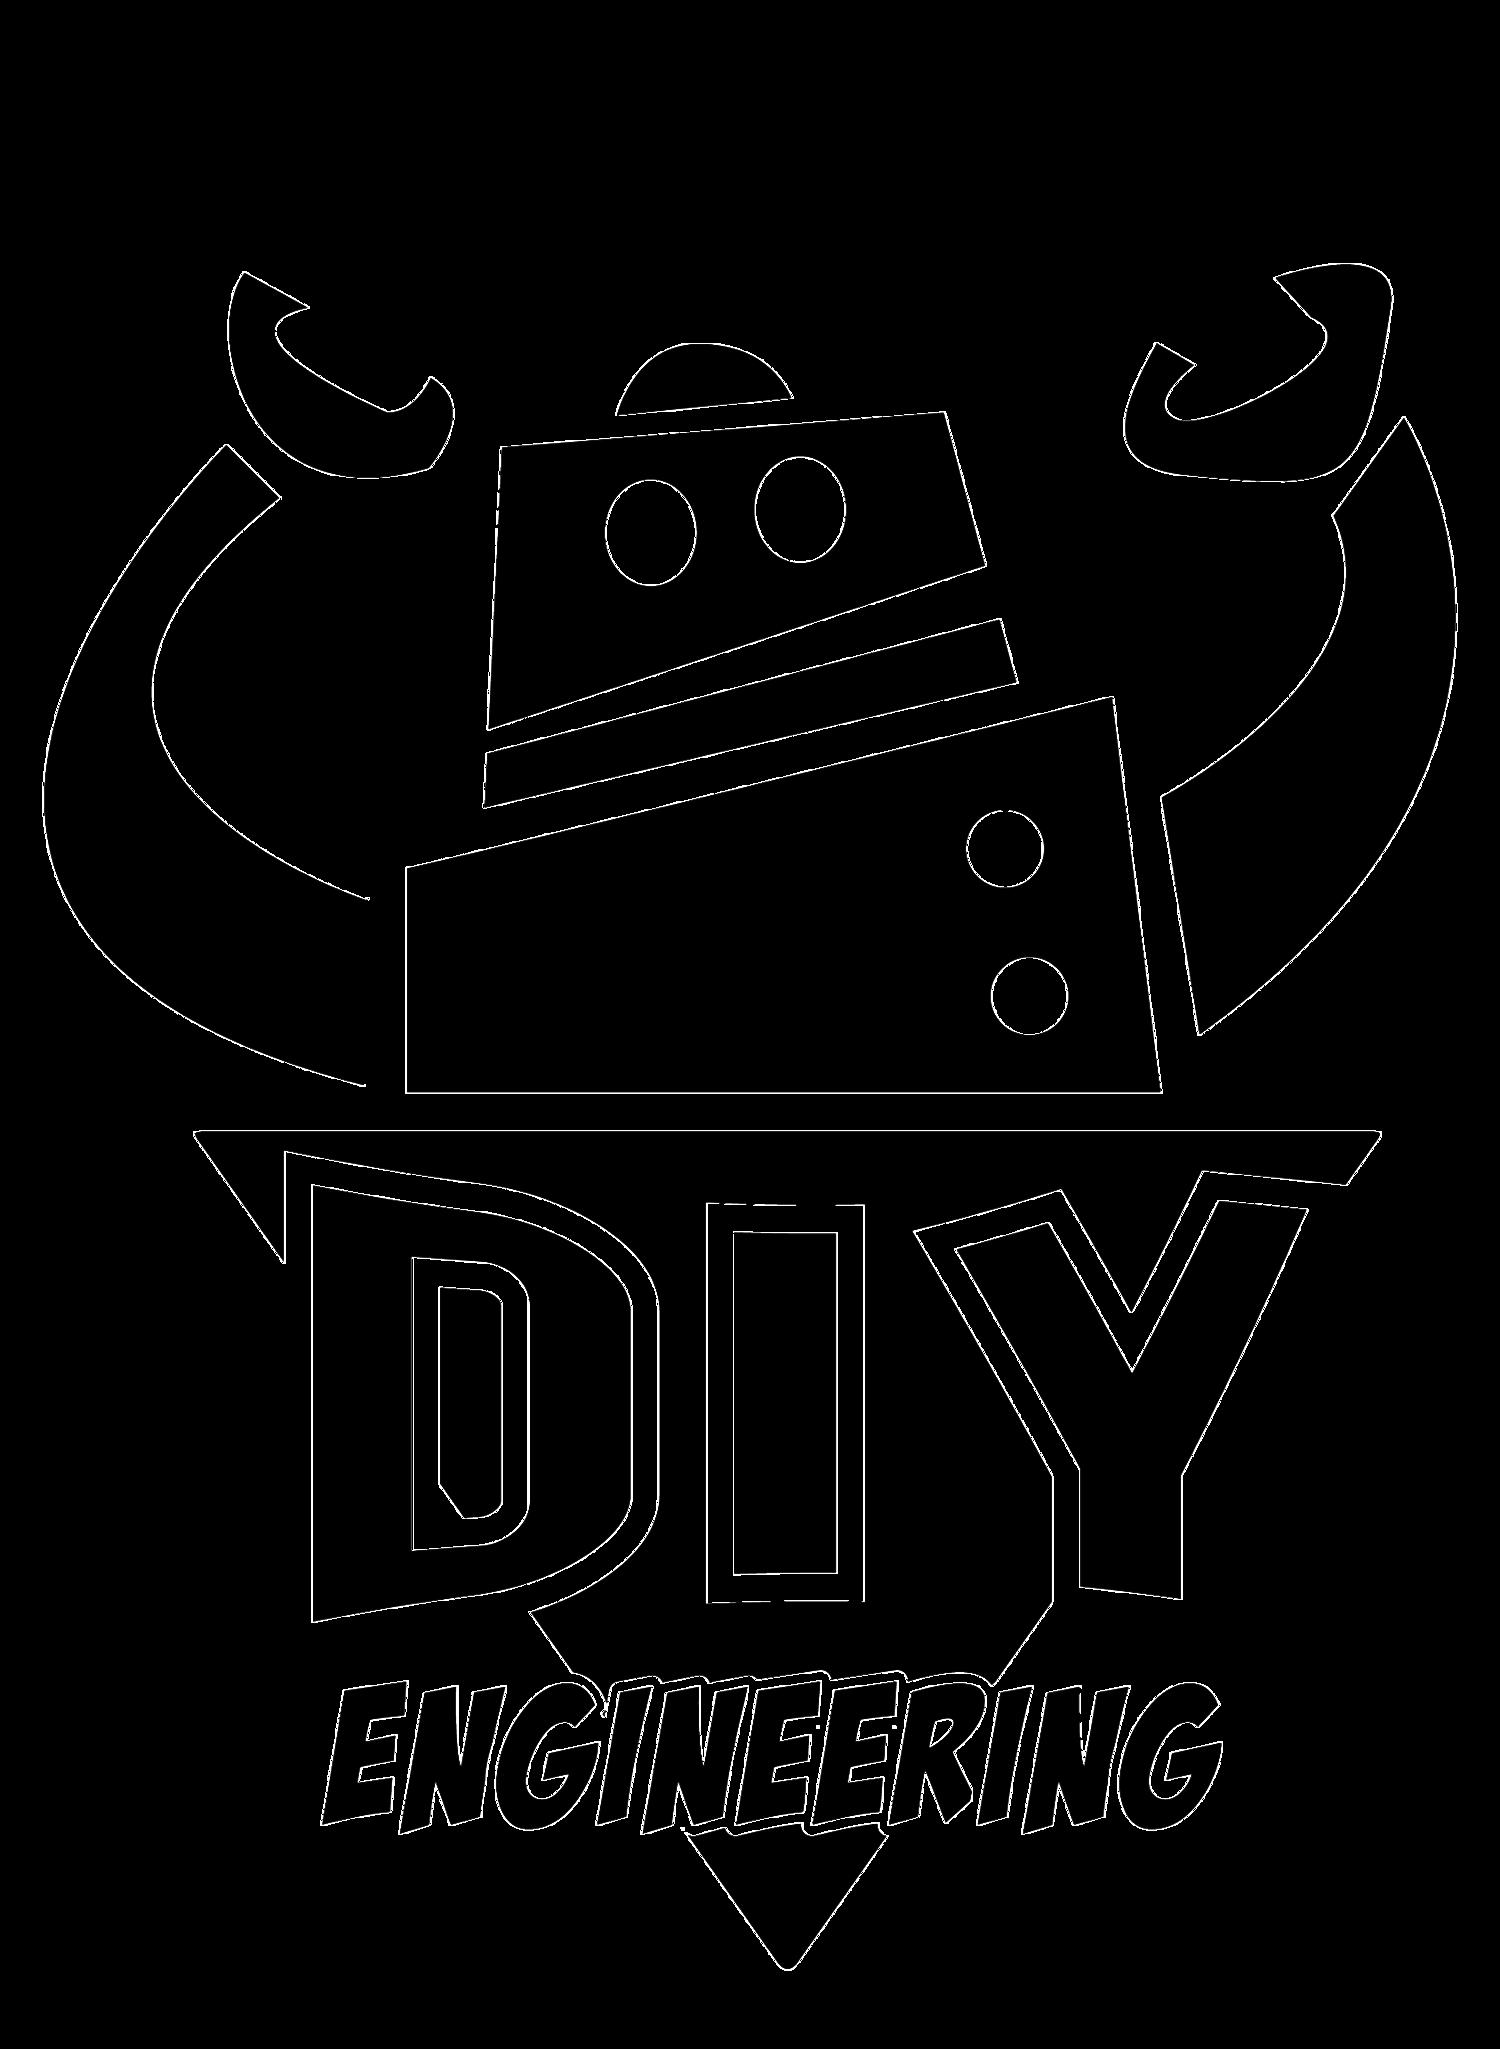 Engineer clipart techy. Diy engineering